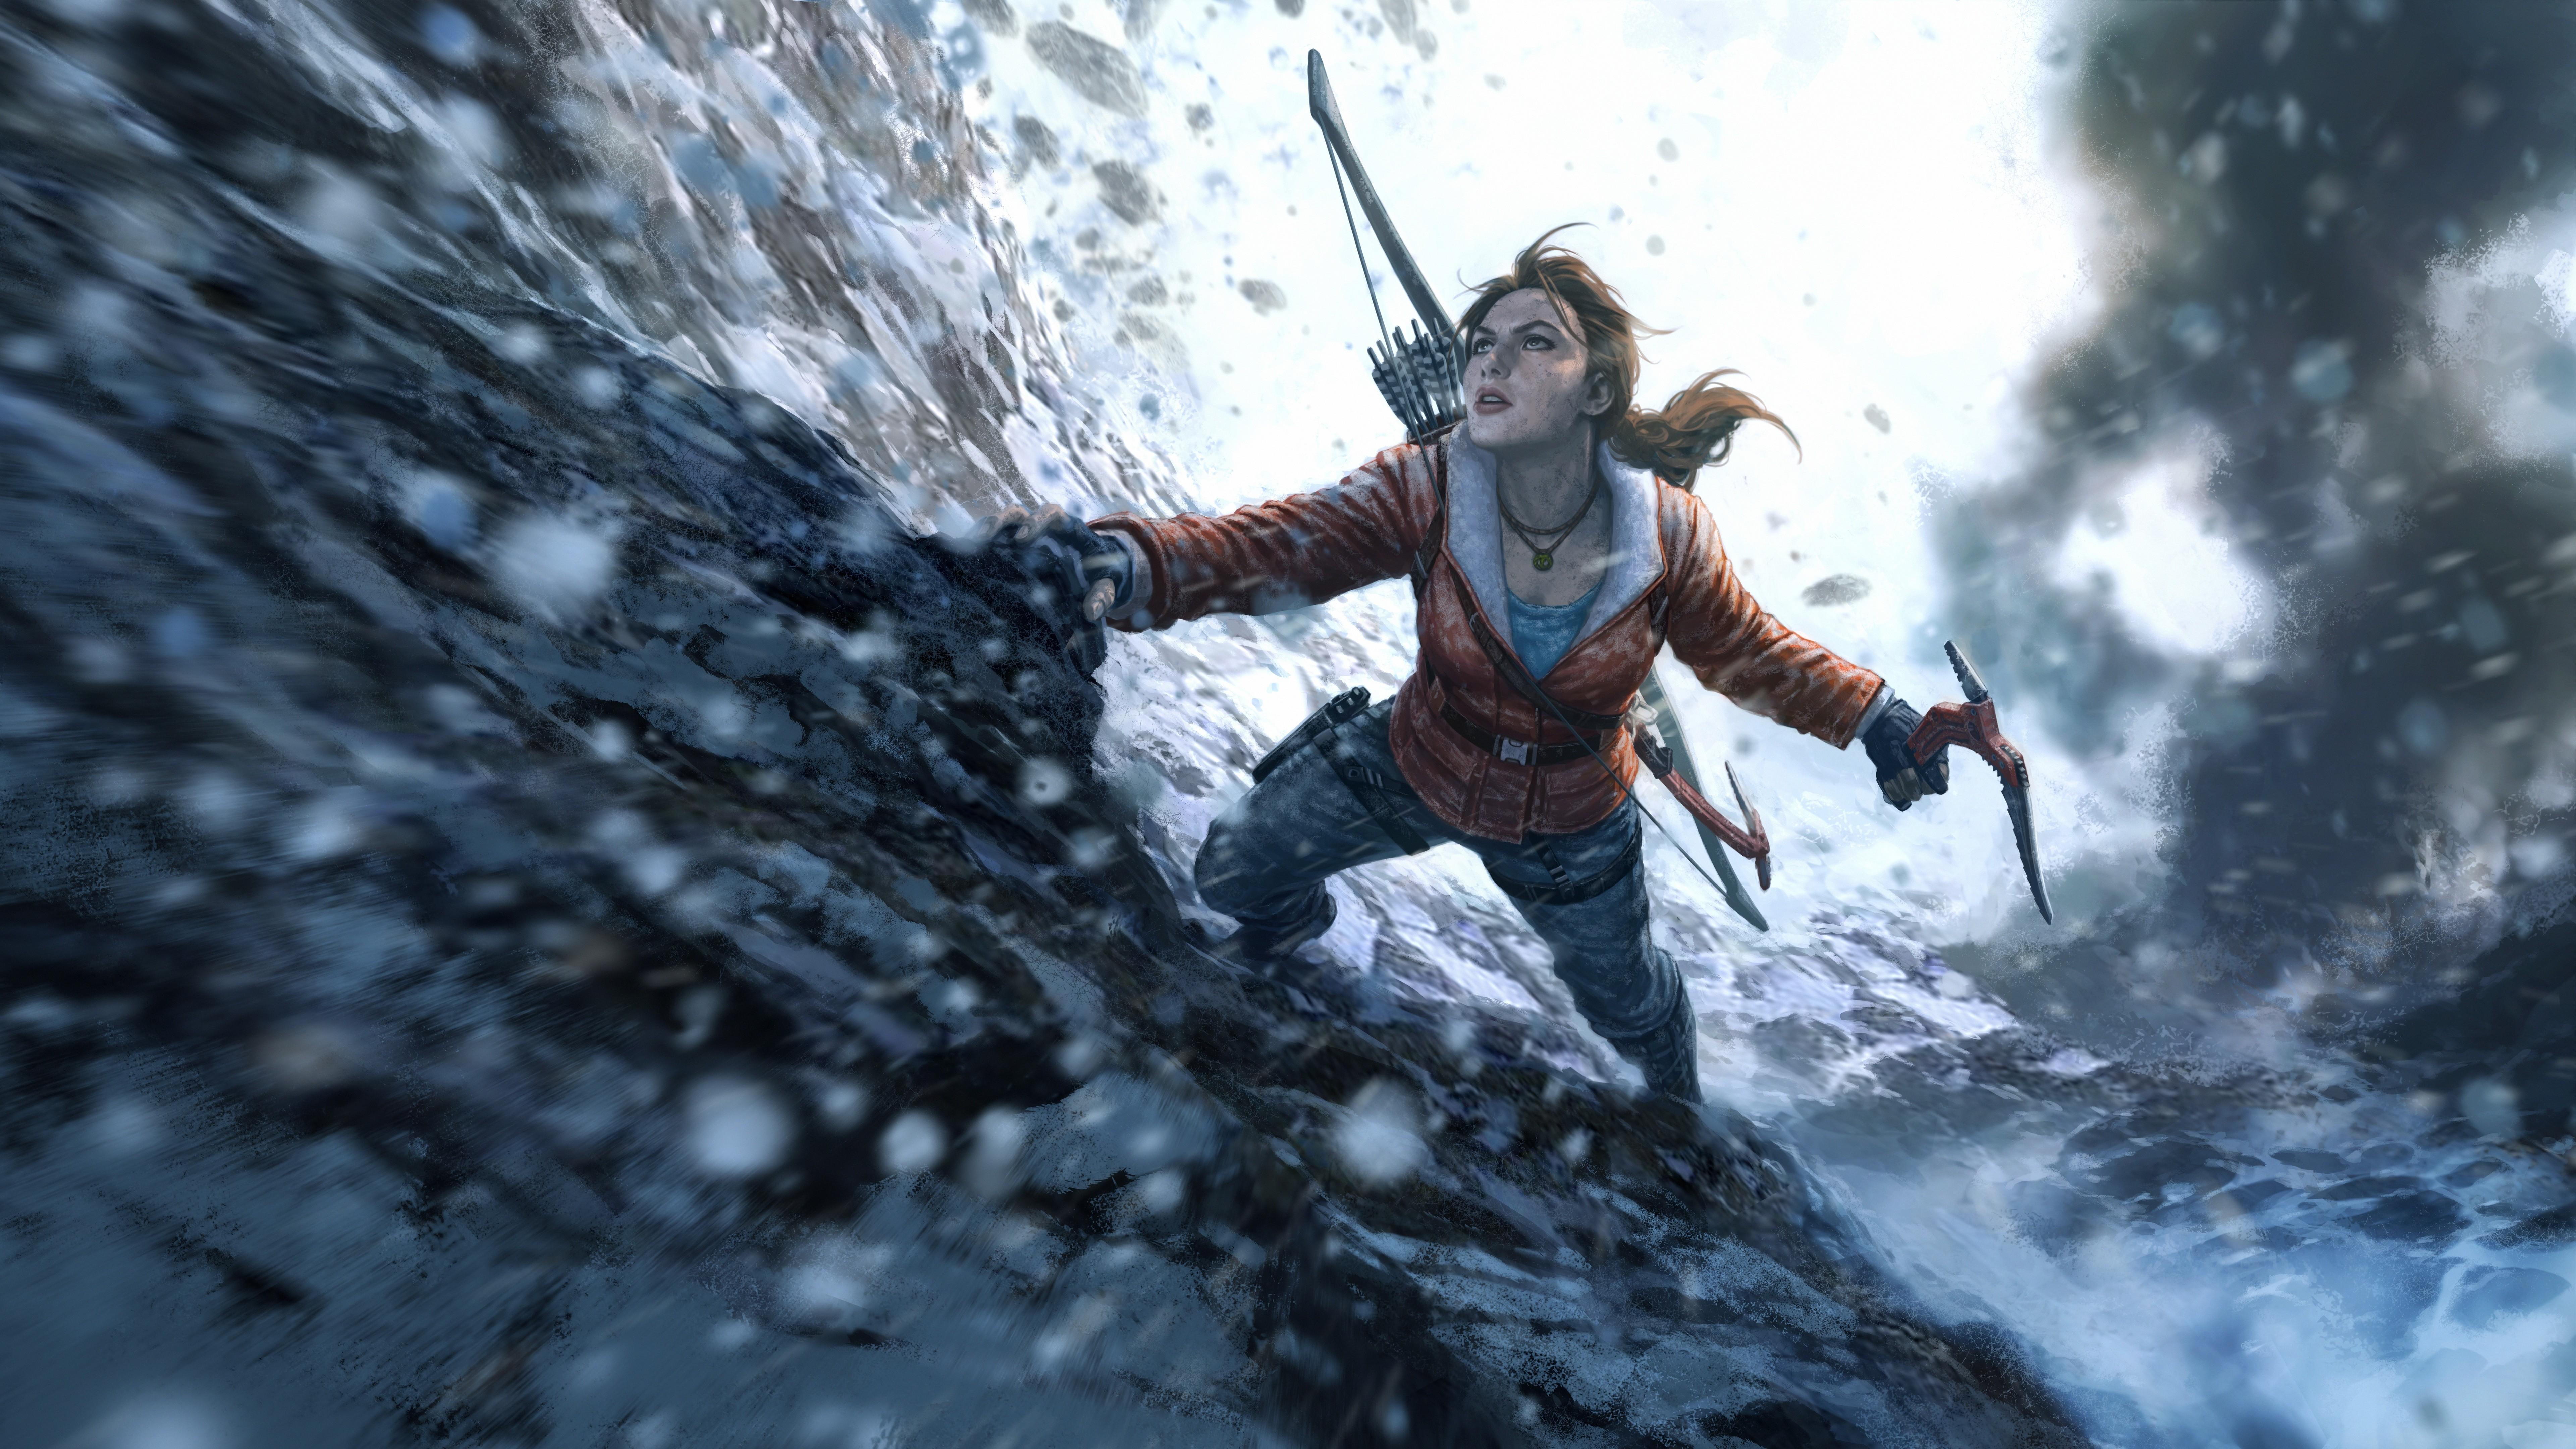 Windows 10 Wallpaper For Girls Wallpaper Rise Of The Tomb Raider 20 Year Celebration